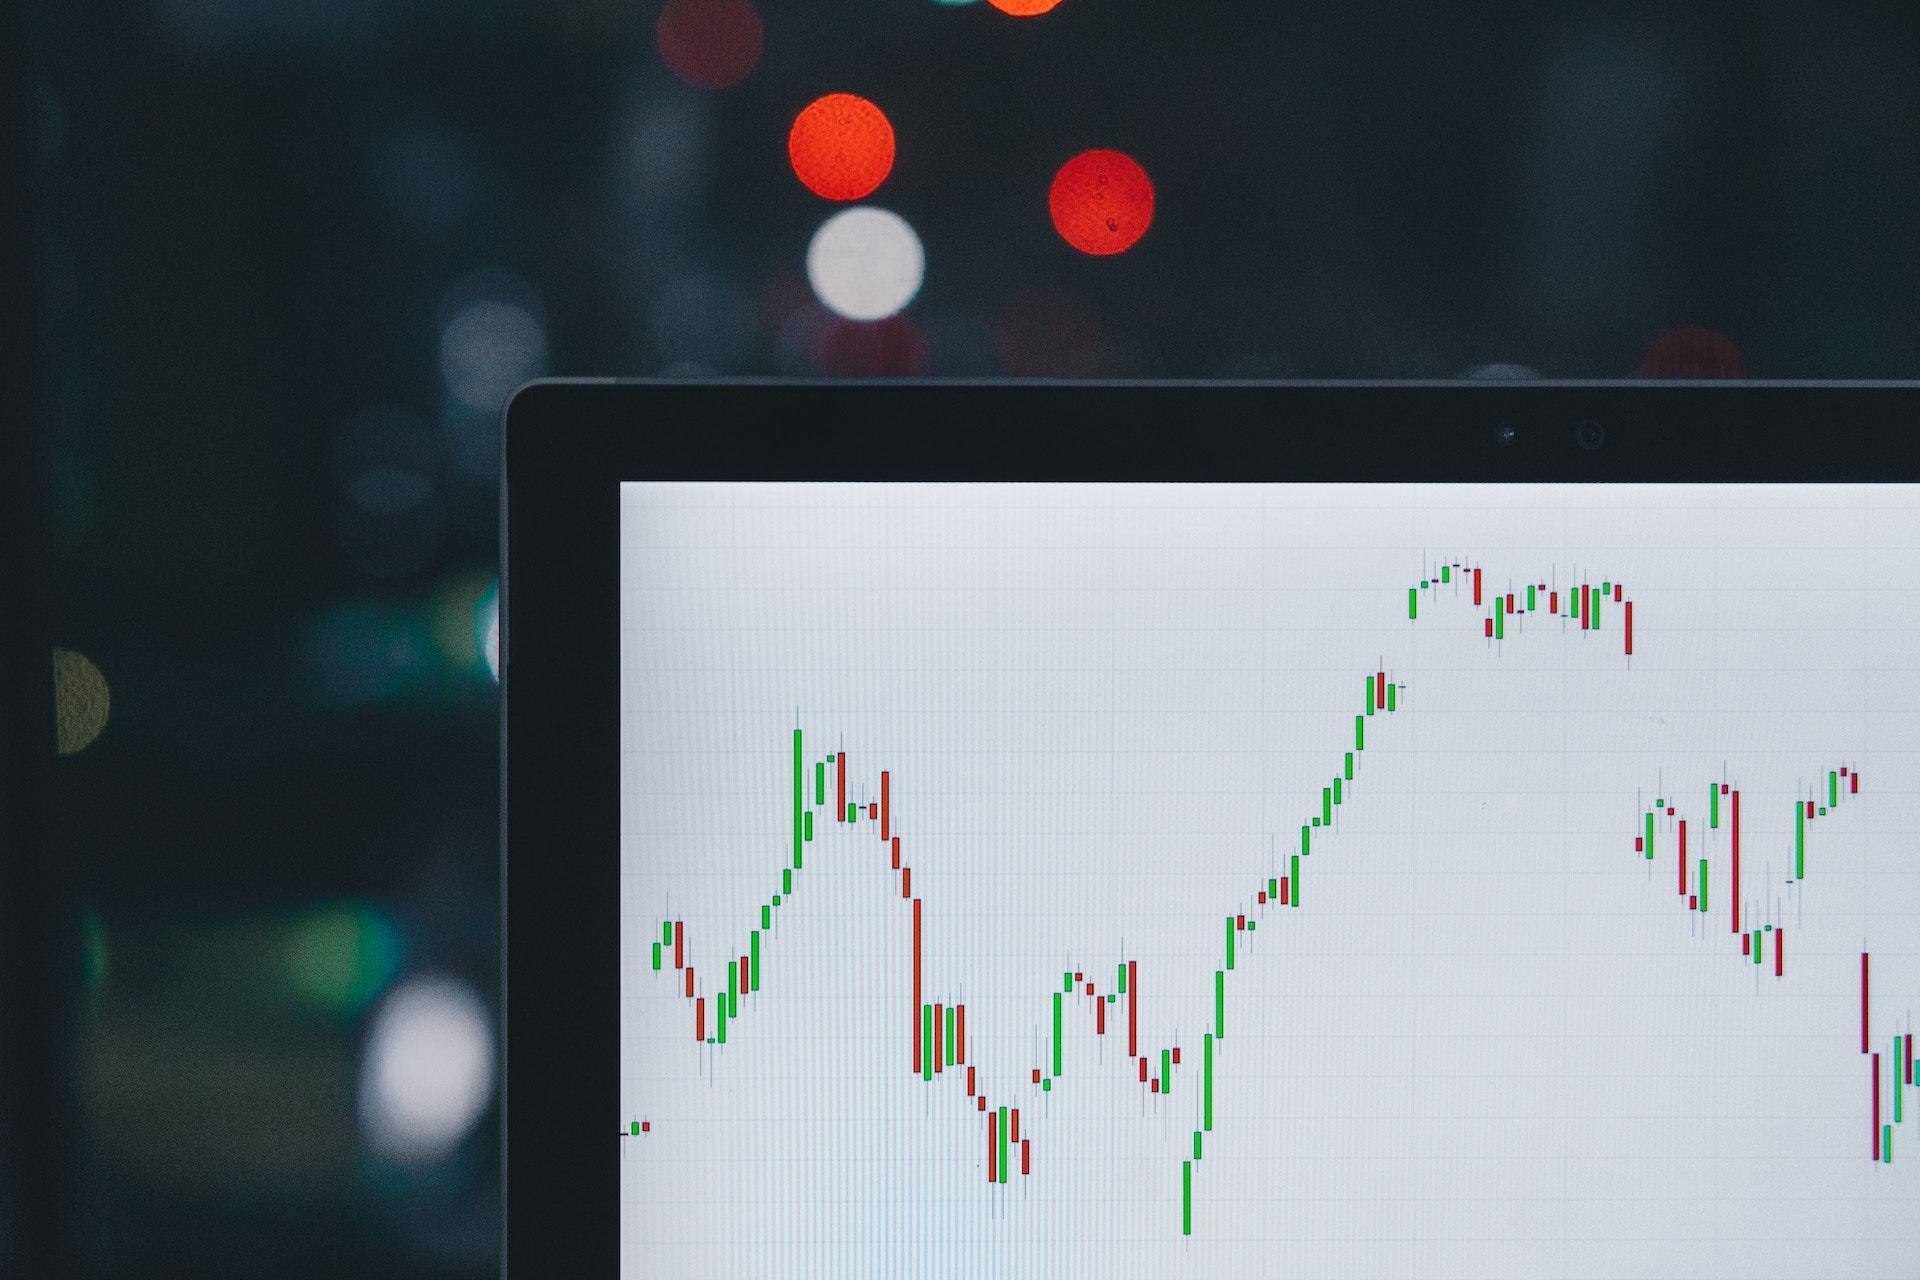 Blockchain 2019 - Nach dem Hype